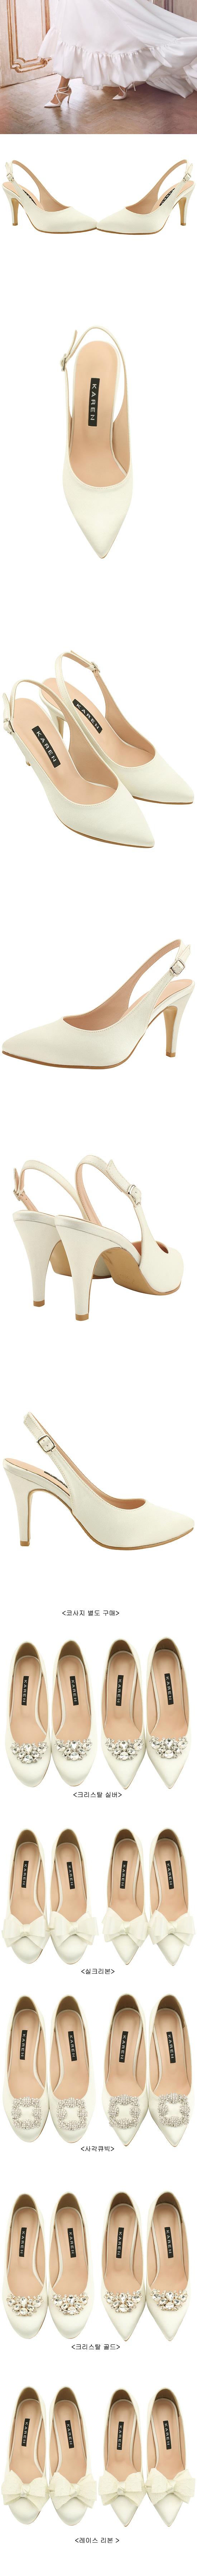 Wedding Shoes Stiletto Slingback High Heels 9cm